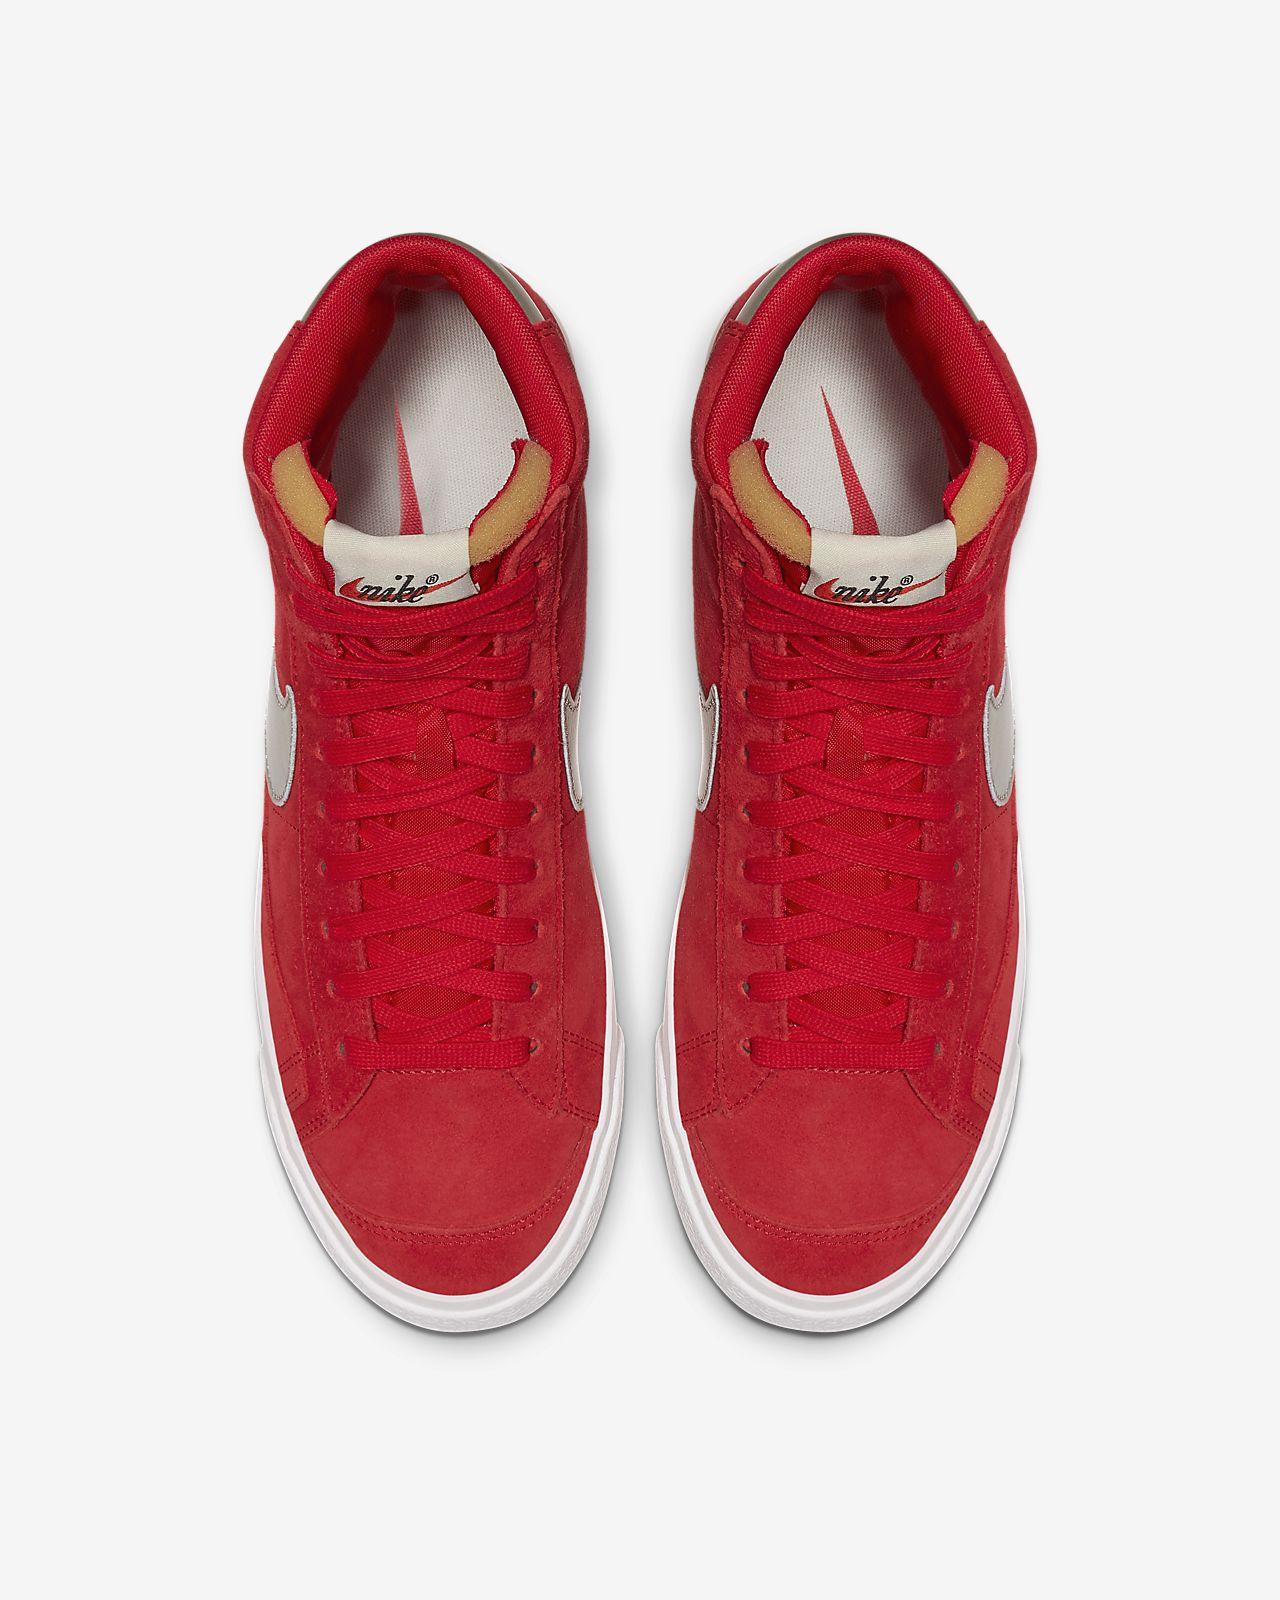 University SailFootshop Silver Nike Red Blazer Metallic 77